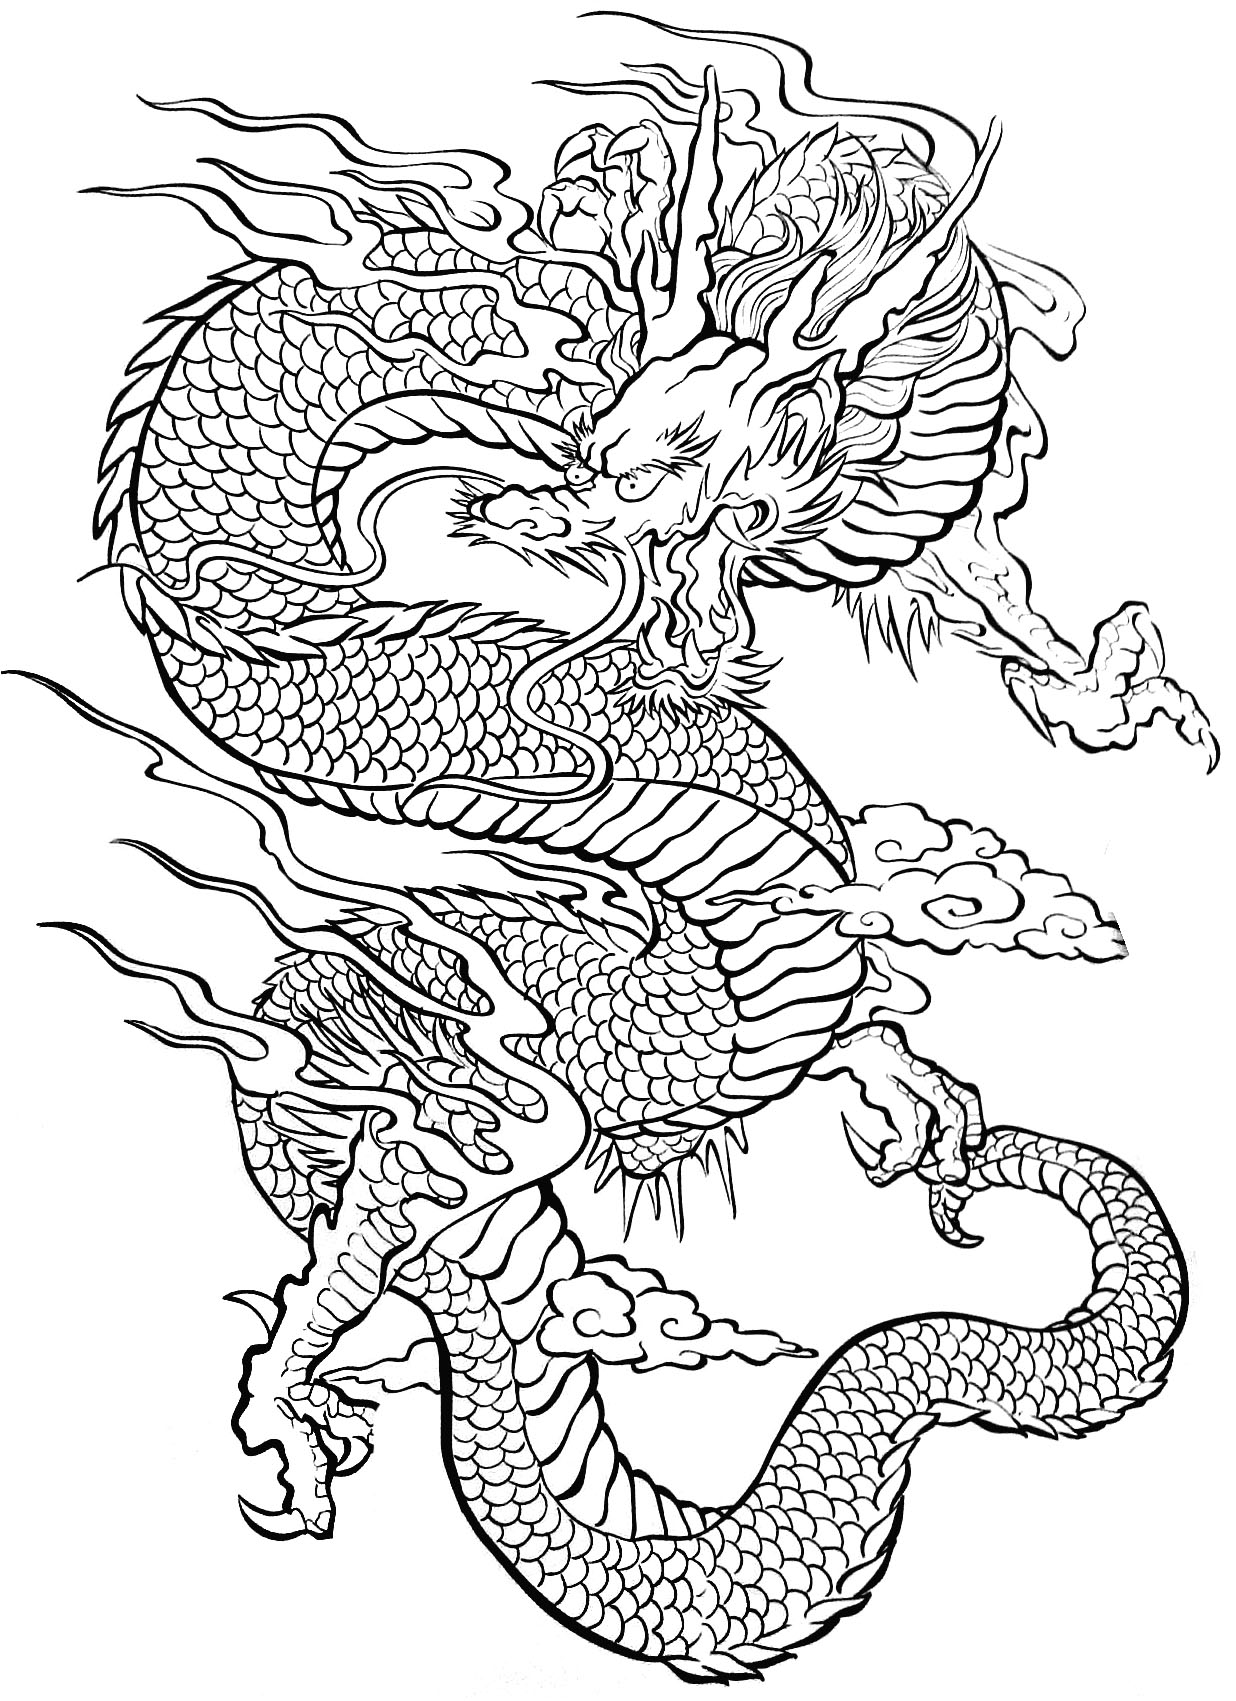 Colorear para adultos : Tatuajes - 5